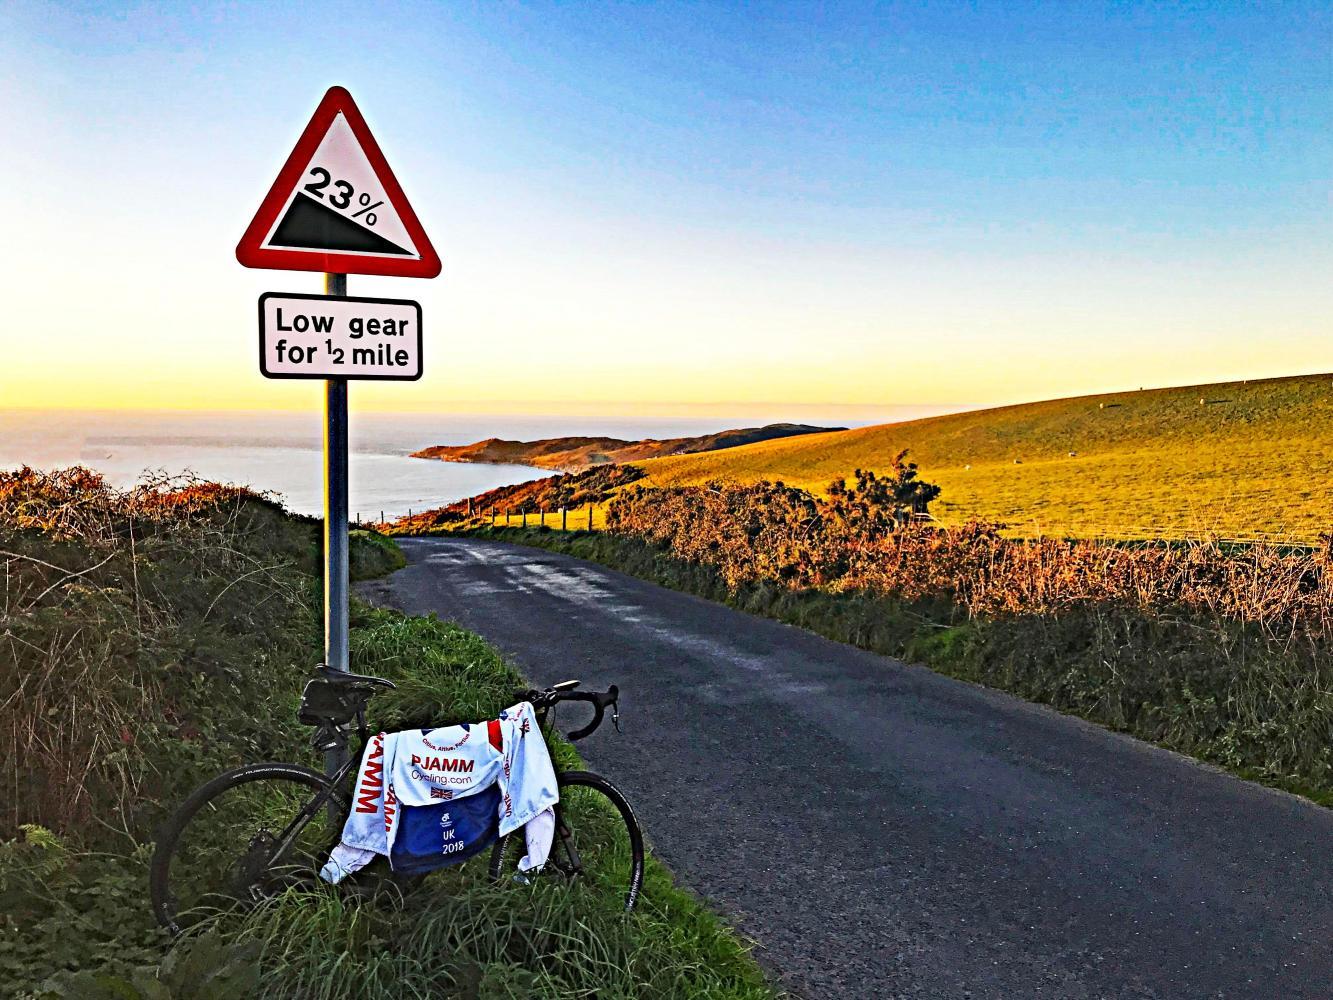 Challacombe Hill (SW #7) Bike Climb - PJAMM Cycling